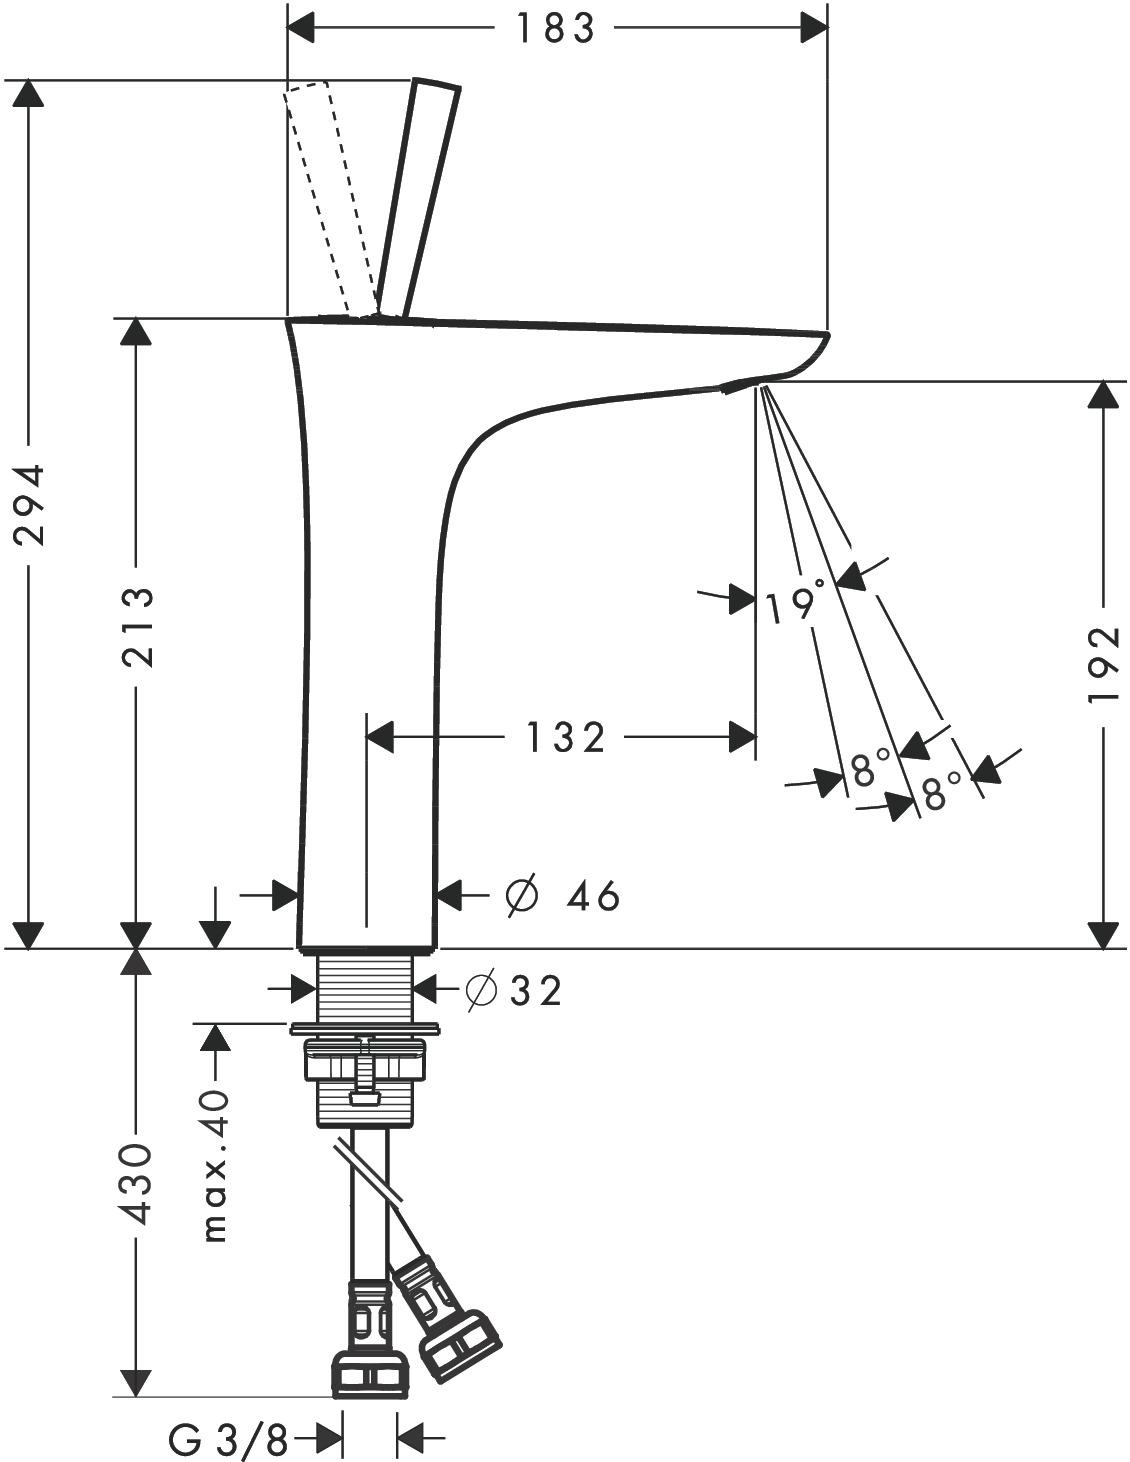 PuraVida Washbasin mixers: Chrome, Item No. 15081000